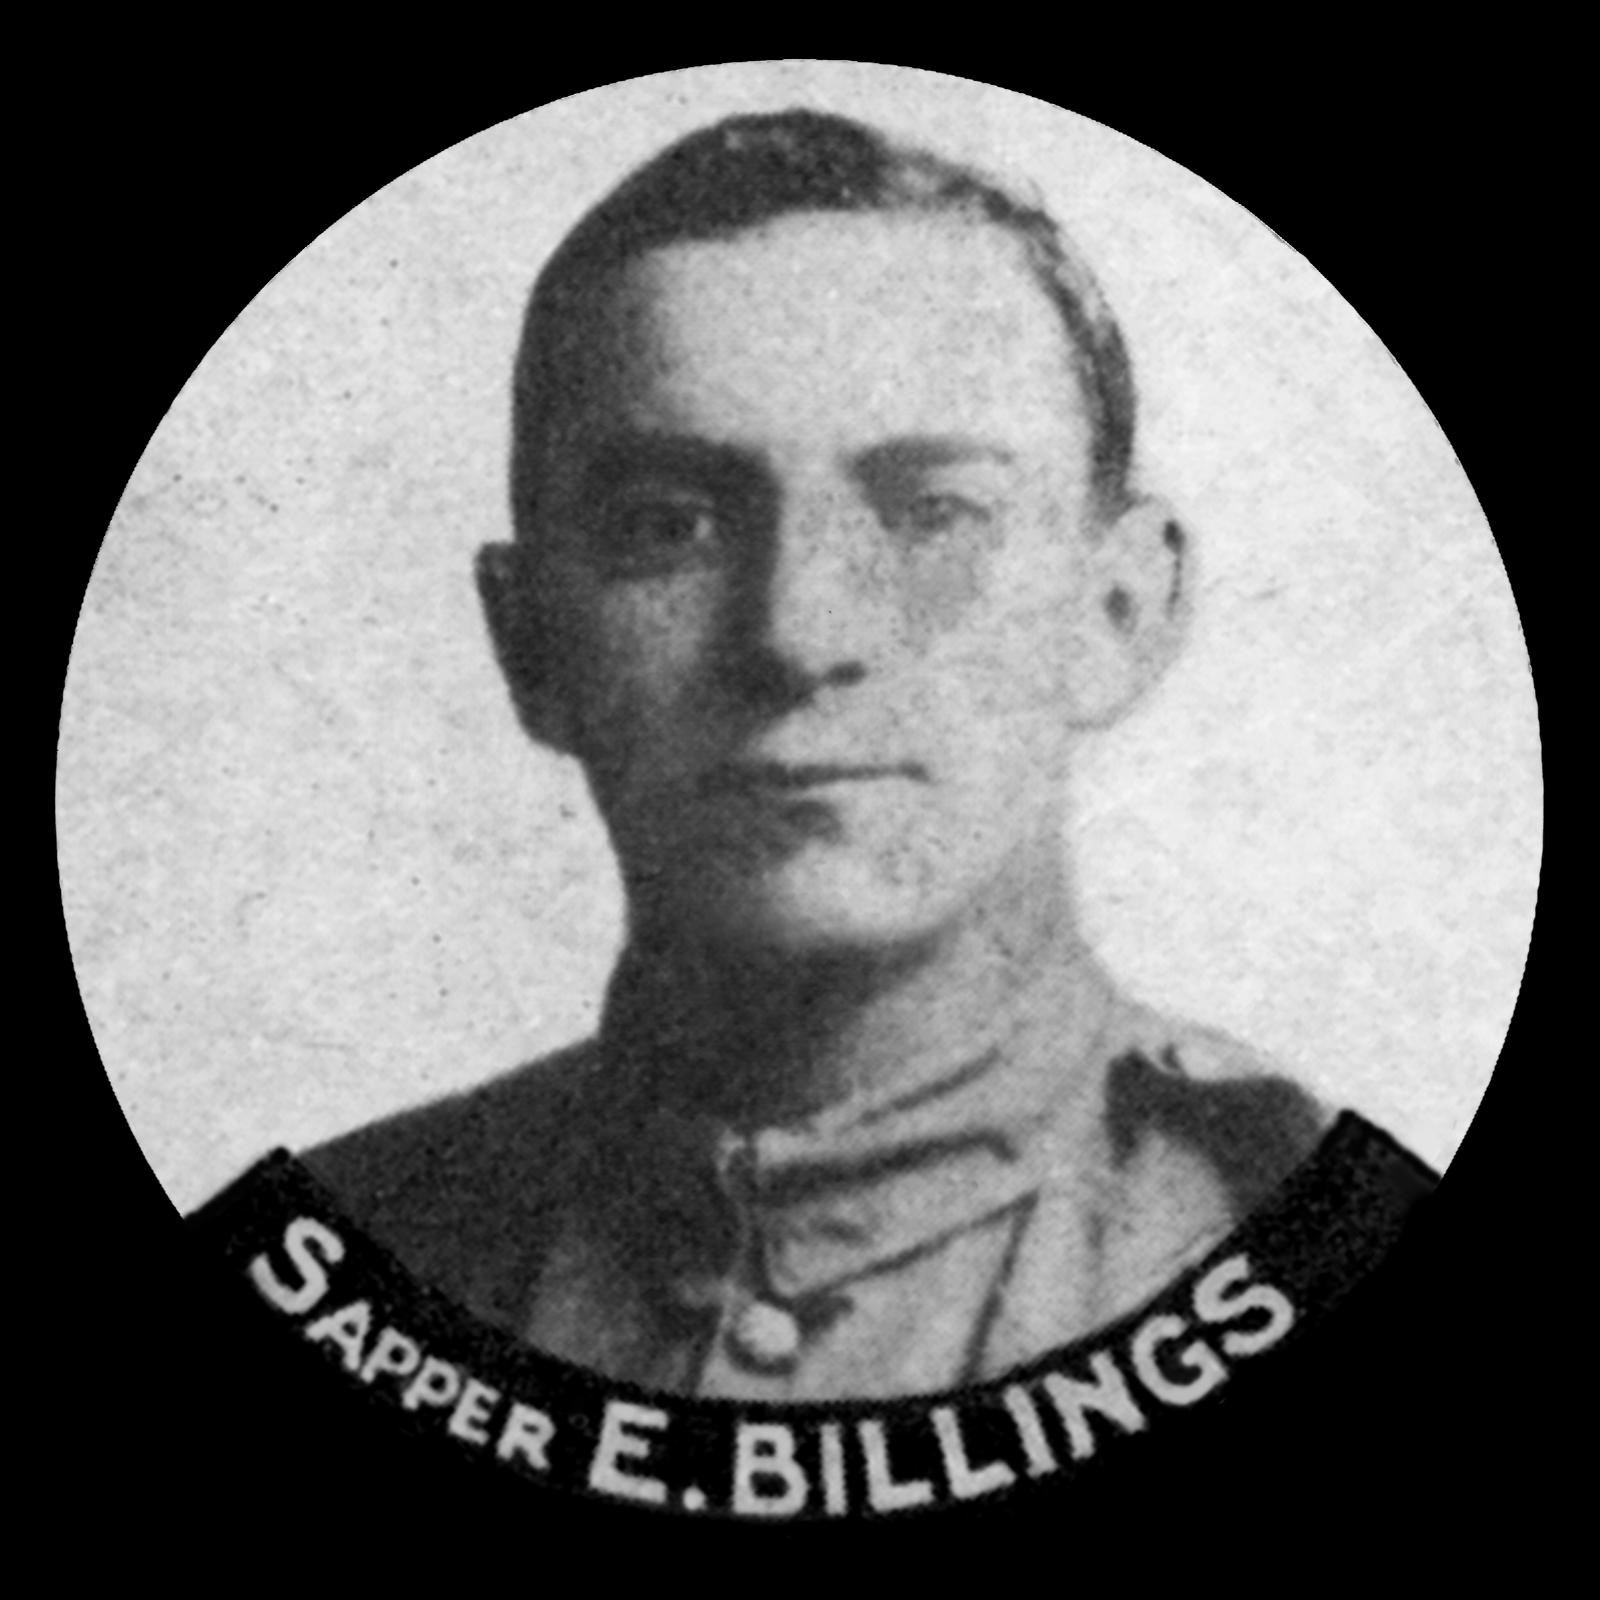 BILLINGS Ernest